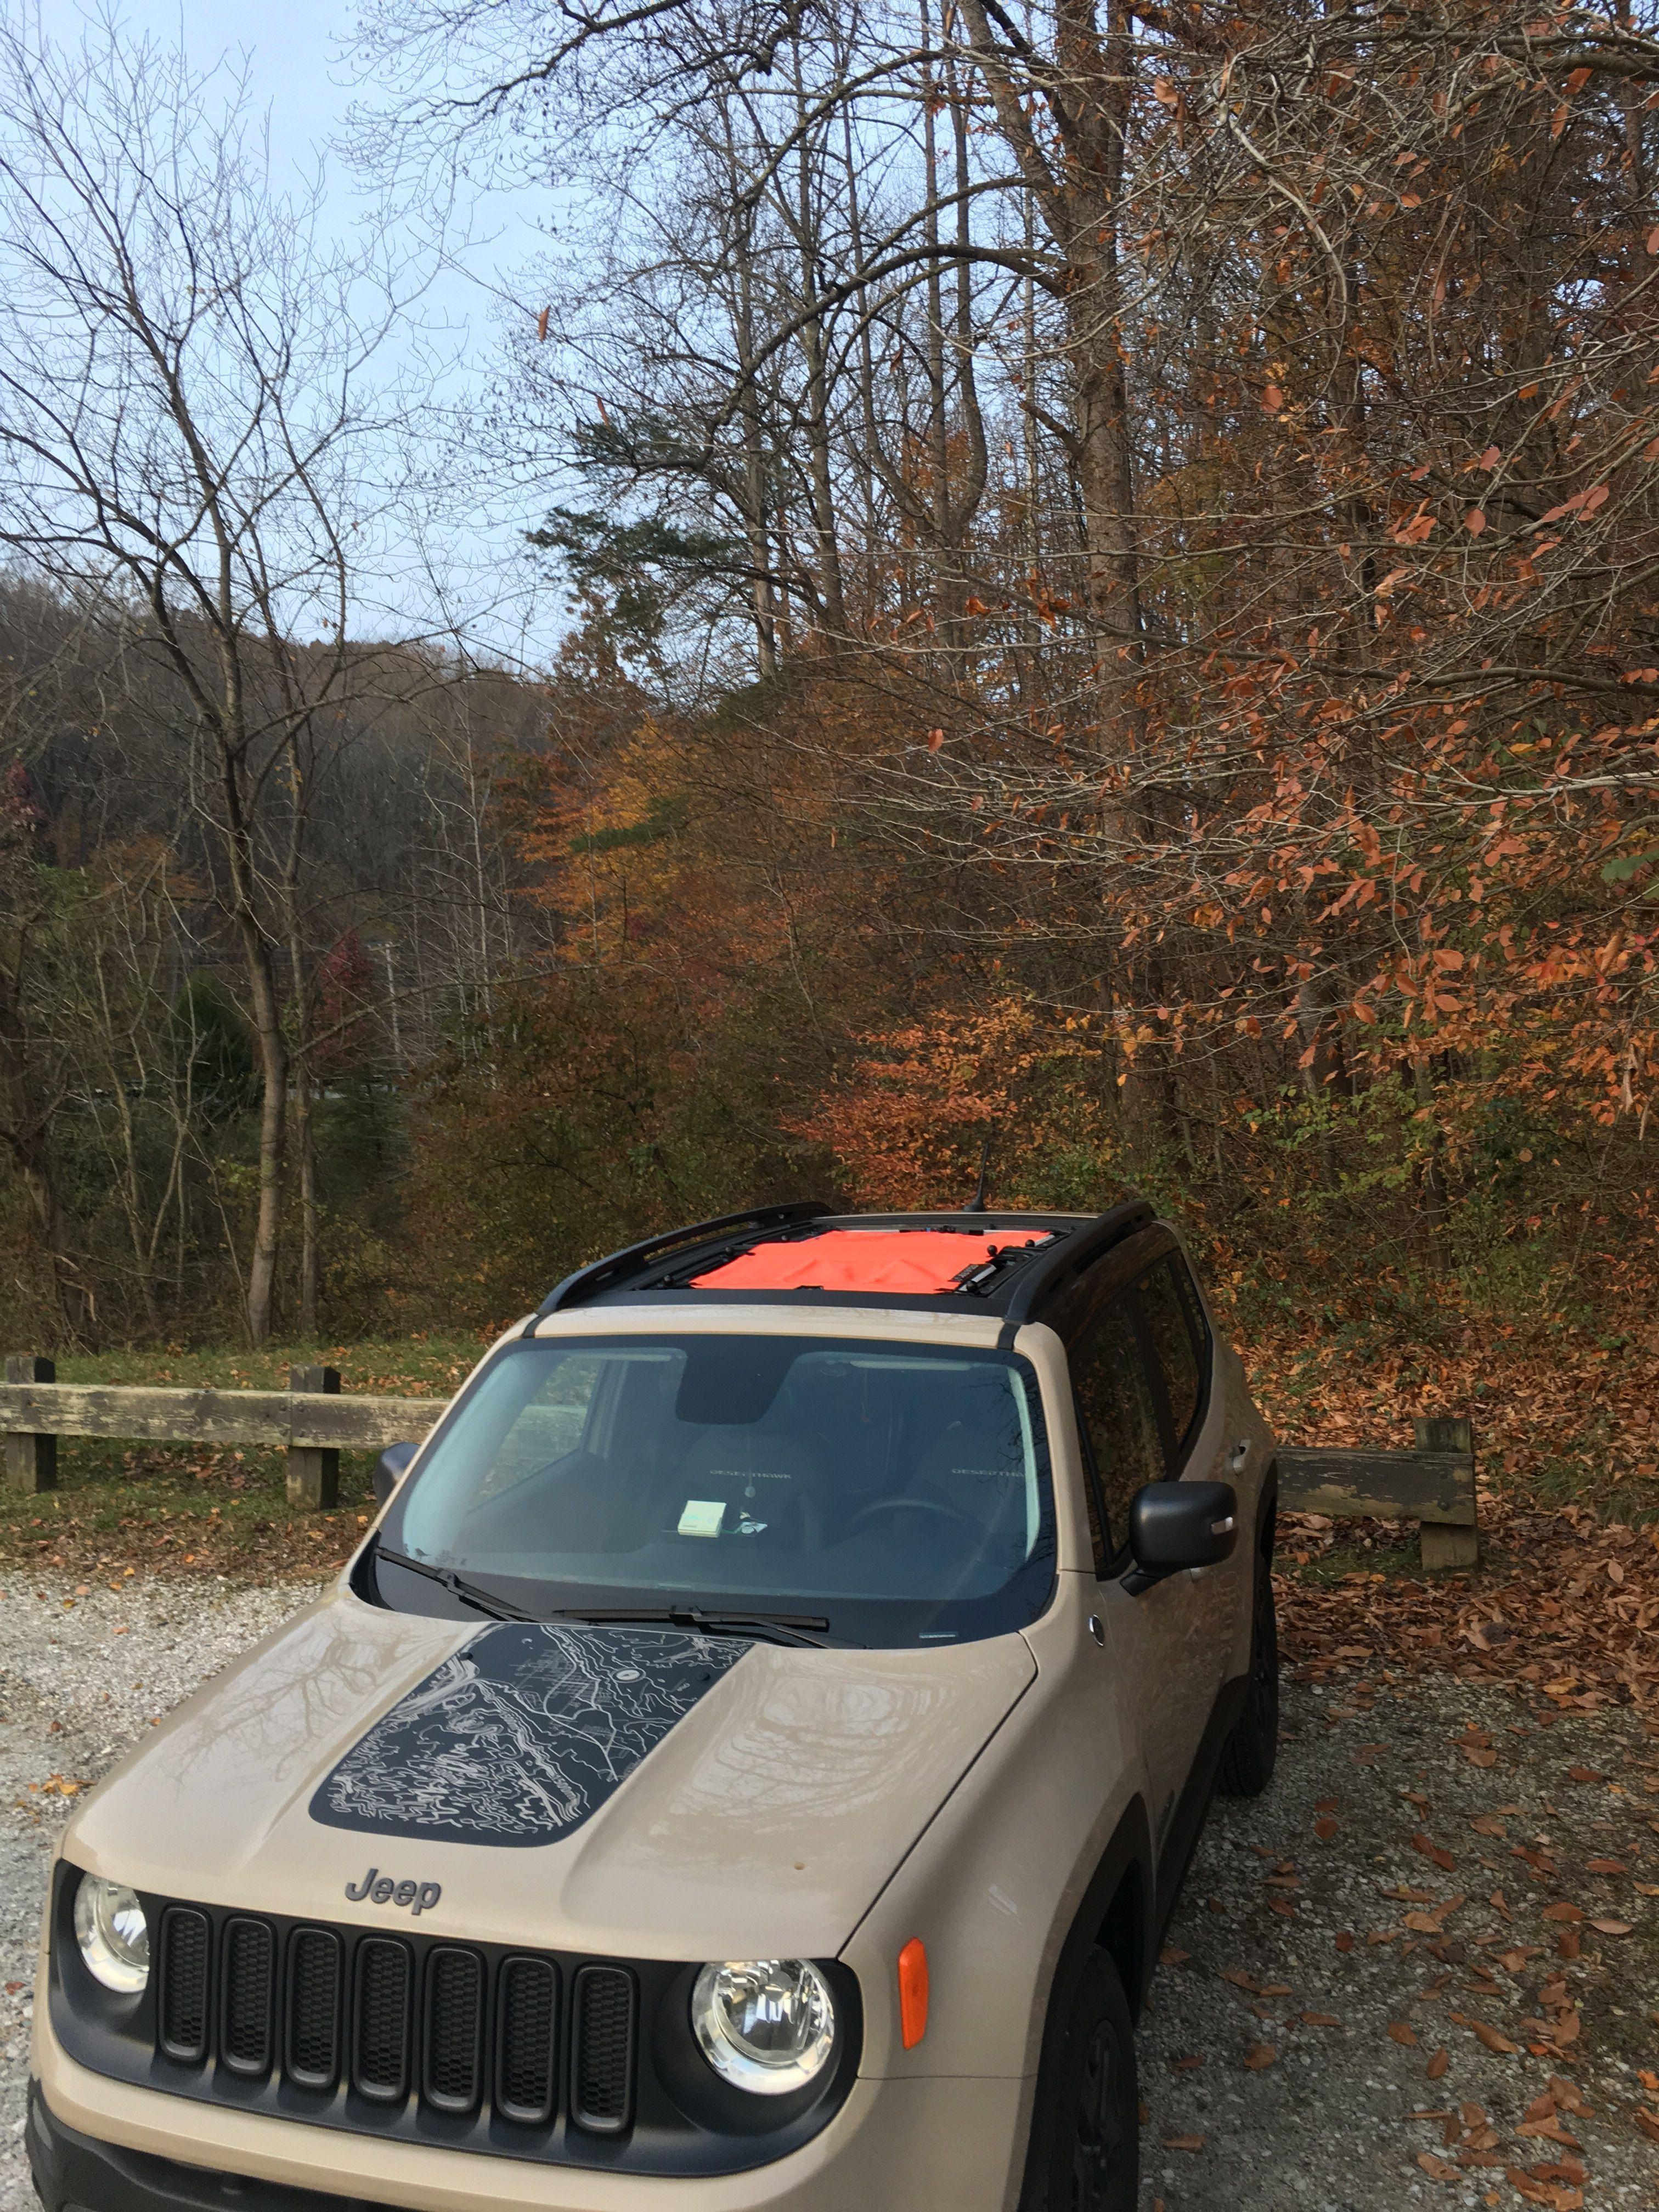 Jeep My Sky : Colored, Renegade, Sunshade, Installed, Customer's, MySky., Reneshade.👽, Renegade,, Jeep,